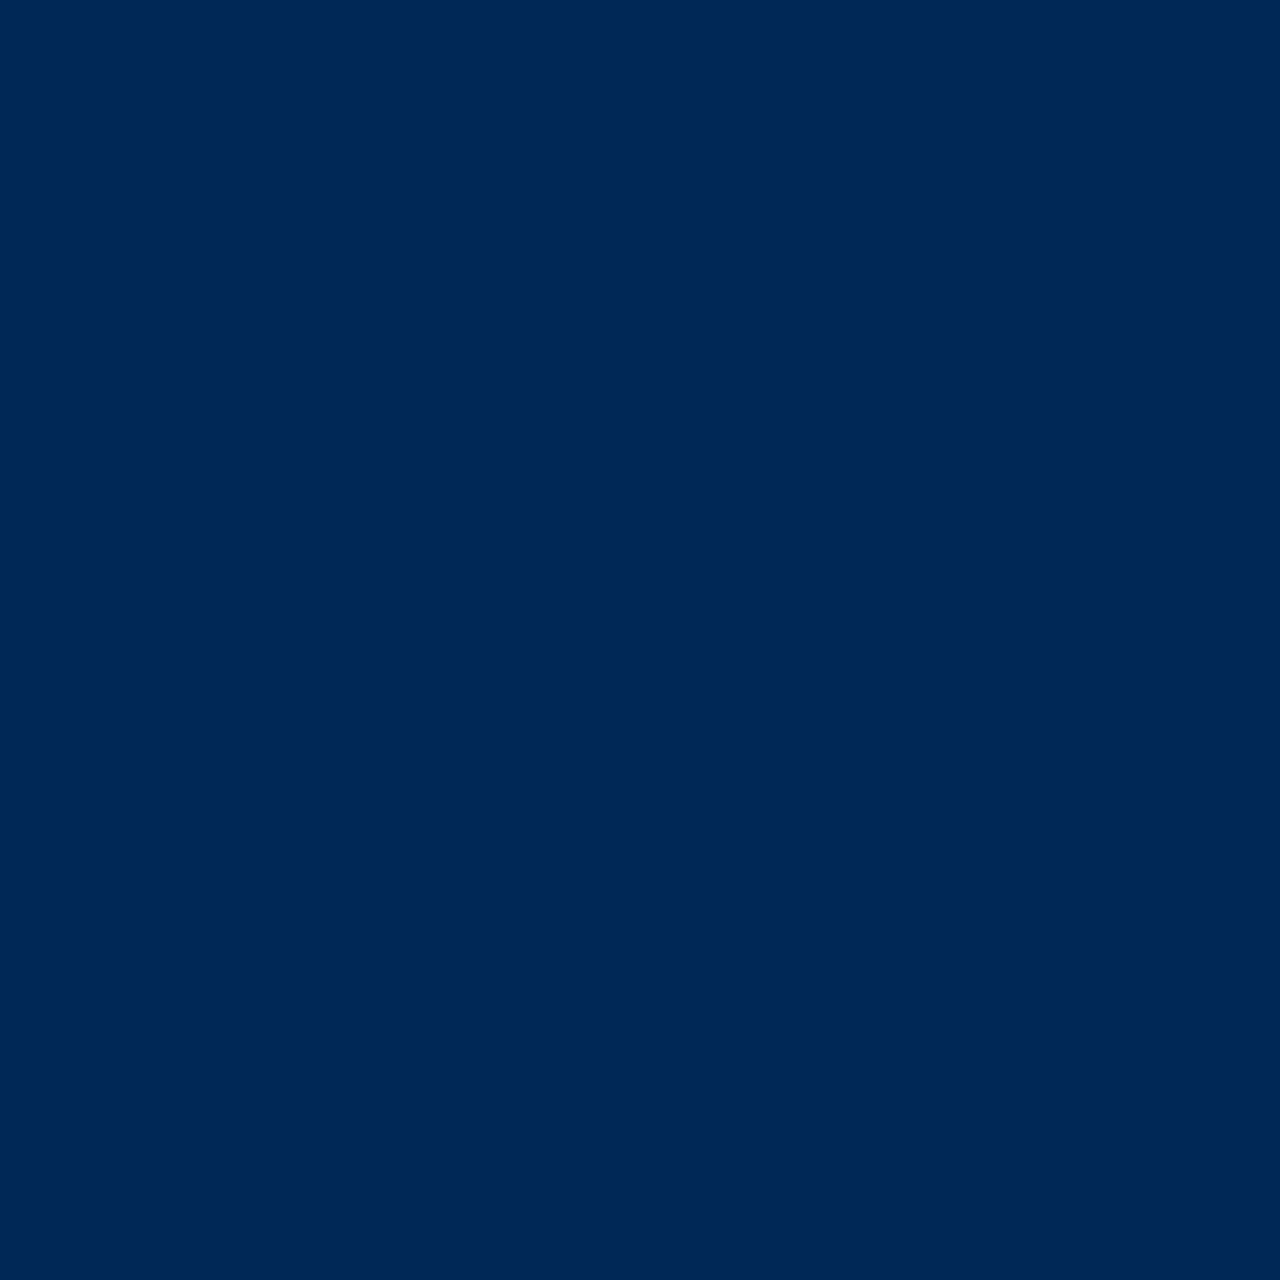 PMS 295C Dark Blue (secondary)